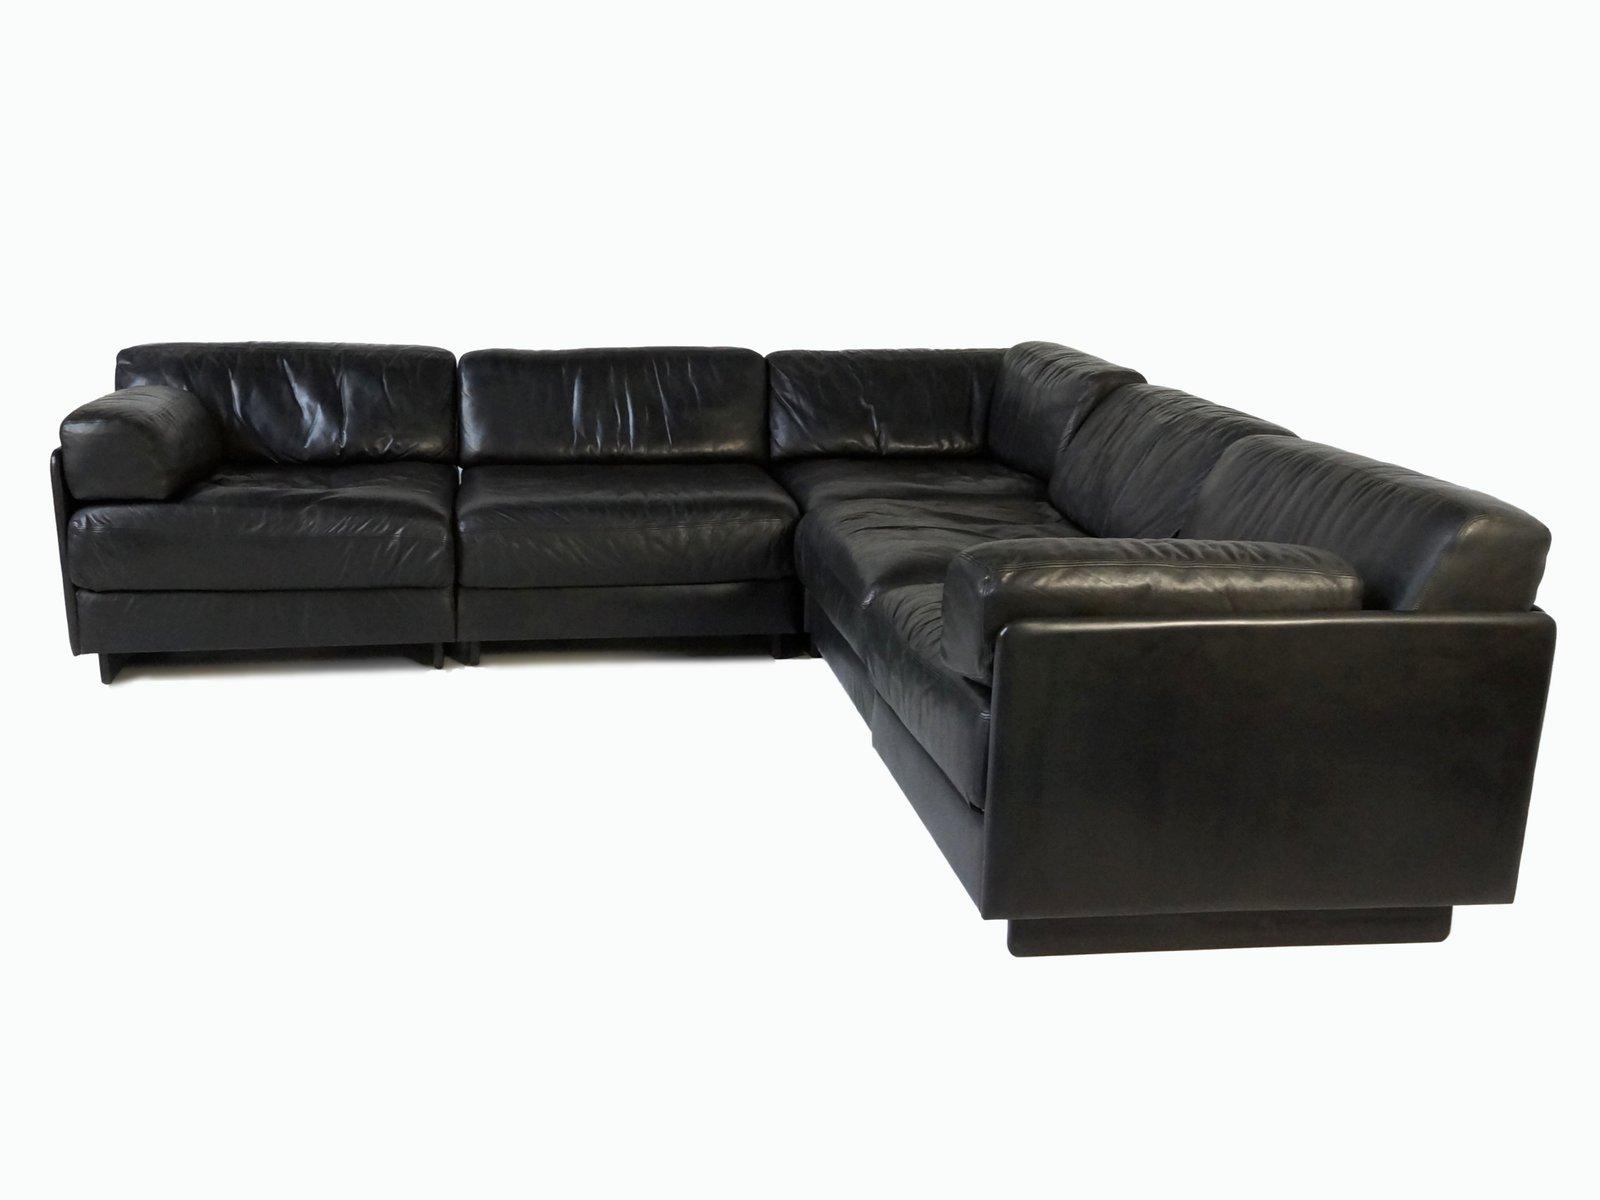 schwarzes ds 76 leder element sofa von de sede bei pamono kaufen. Black Bedroom Furniture Sets. Home Design Ideas